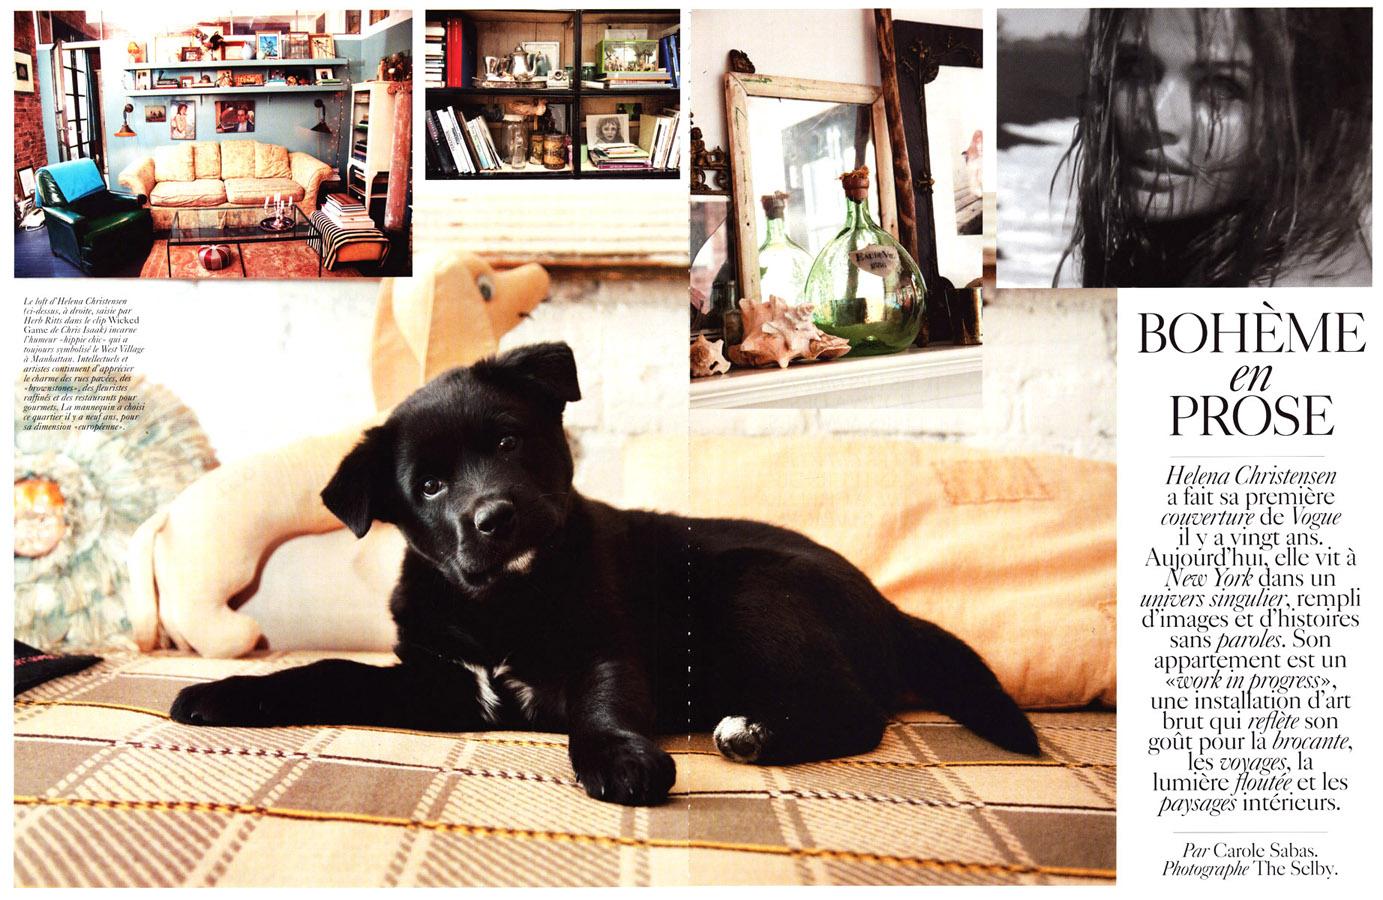 http://1.bp.blogspot.com/-IhHyMl85mGo/UD6uWfEhruI/AAAAAAAAHc8/K1wy58q9LPs/s1600/Helena+Christenson+vintage+style+4.jpg